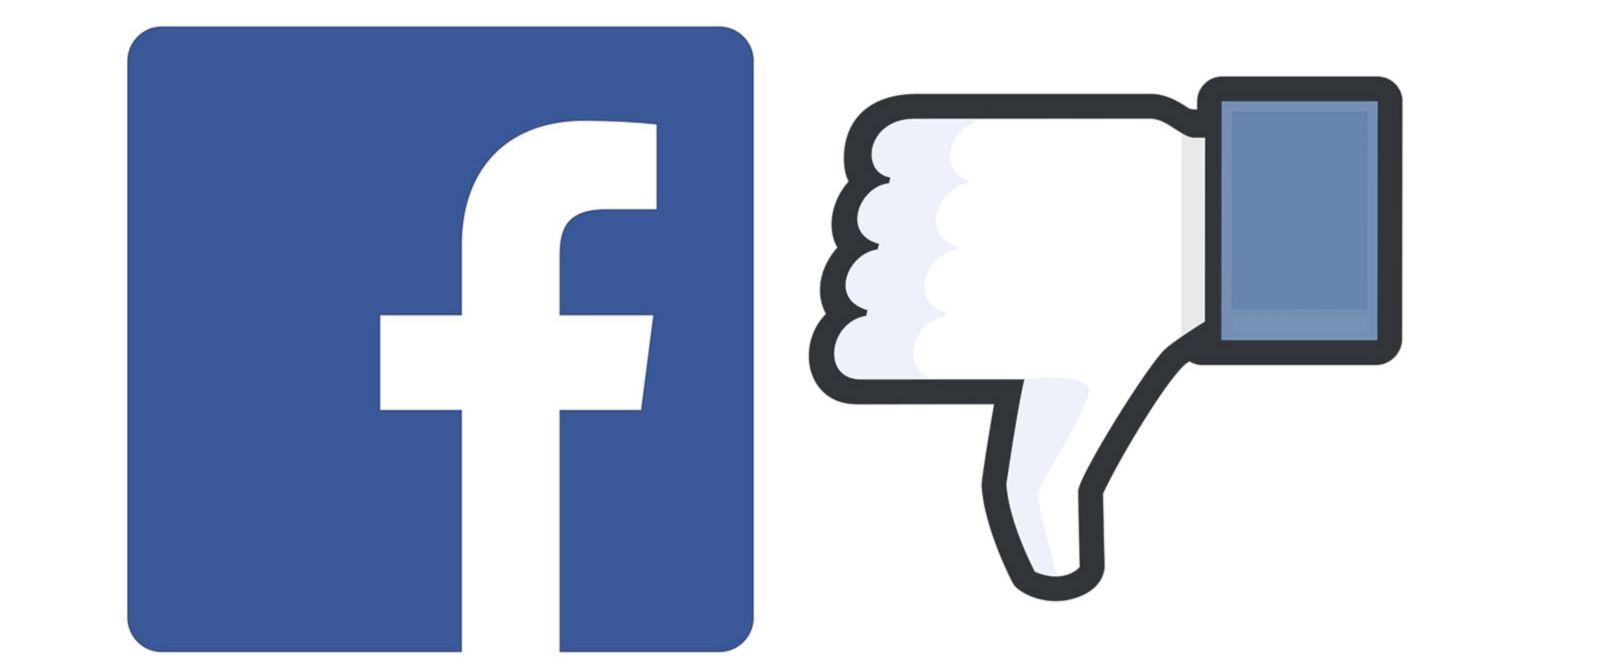 Facebook verso il fallimento? Crollo a Wall Street